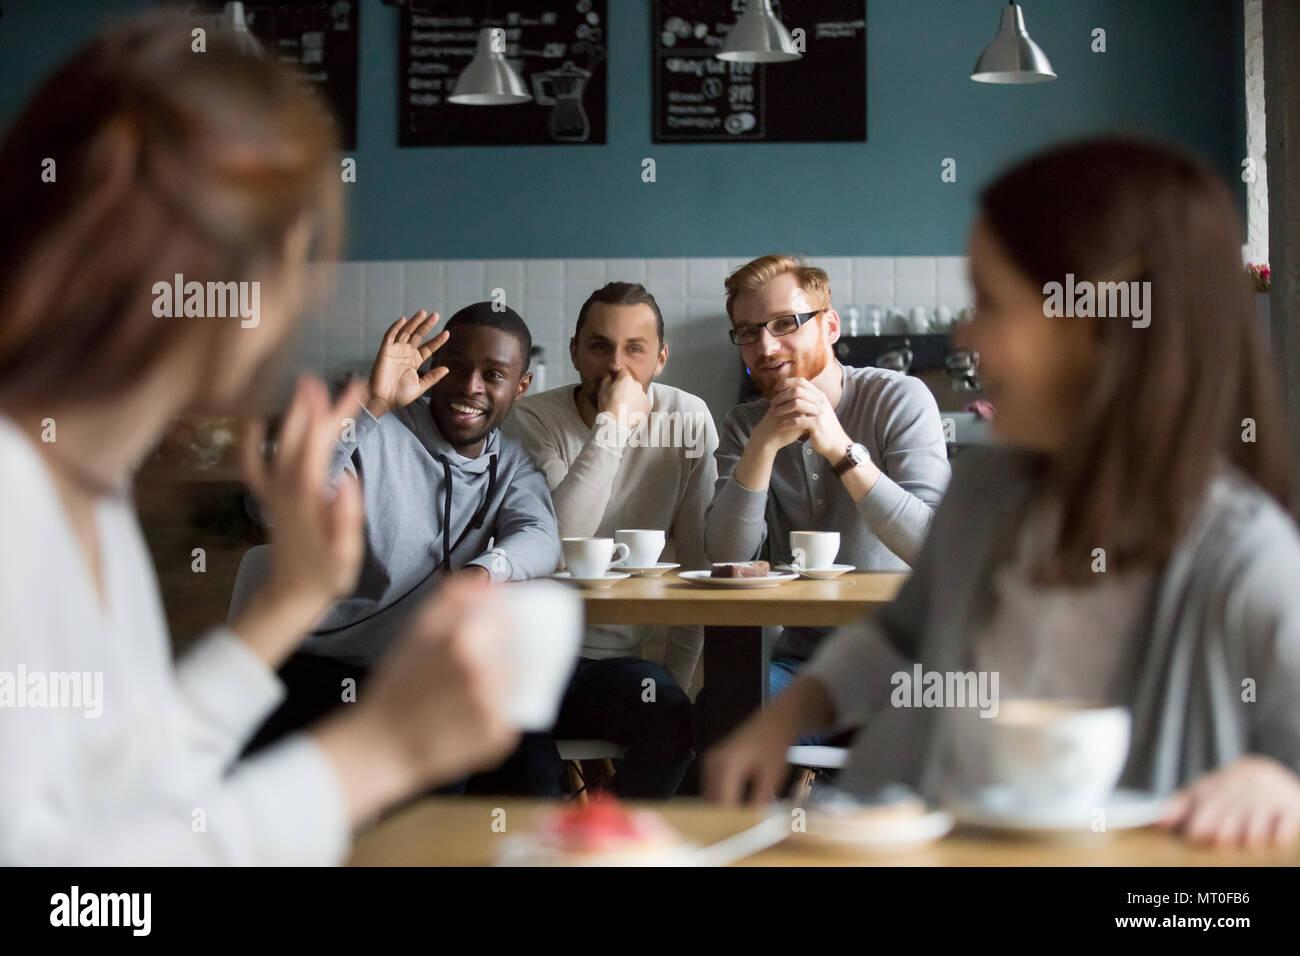 Hombre sonriente africanos agitando la mano saludo niñas reunión de café Imagen De Stock